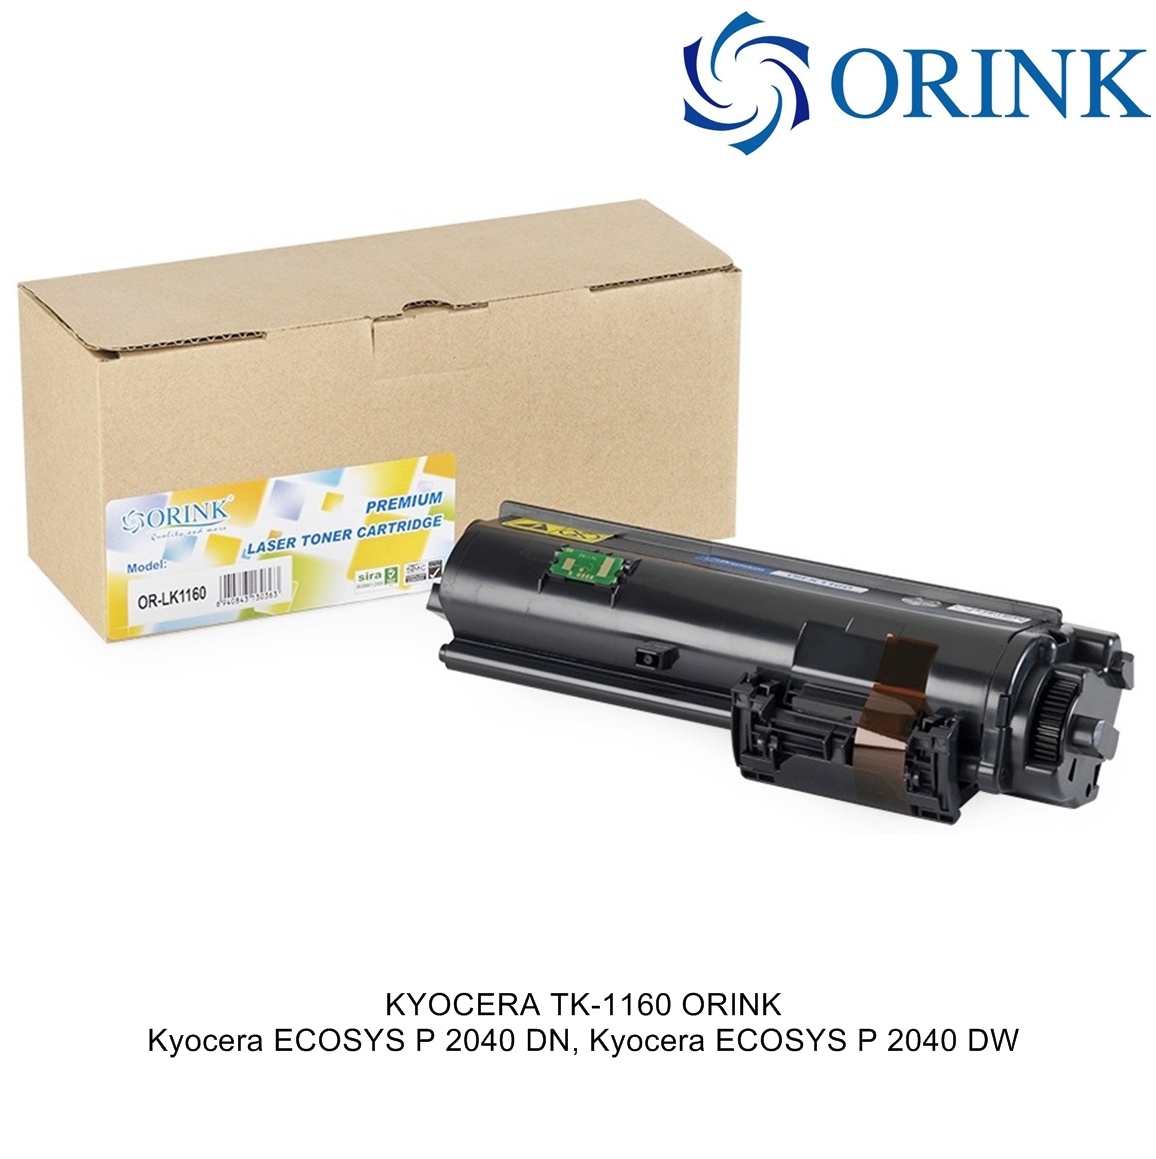 KYOCERA TK-1160 (7.2K) ORINK Тонер Касета